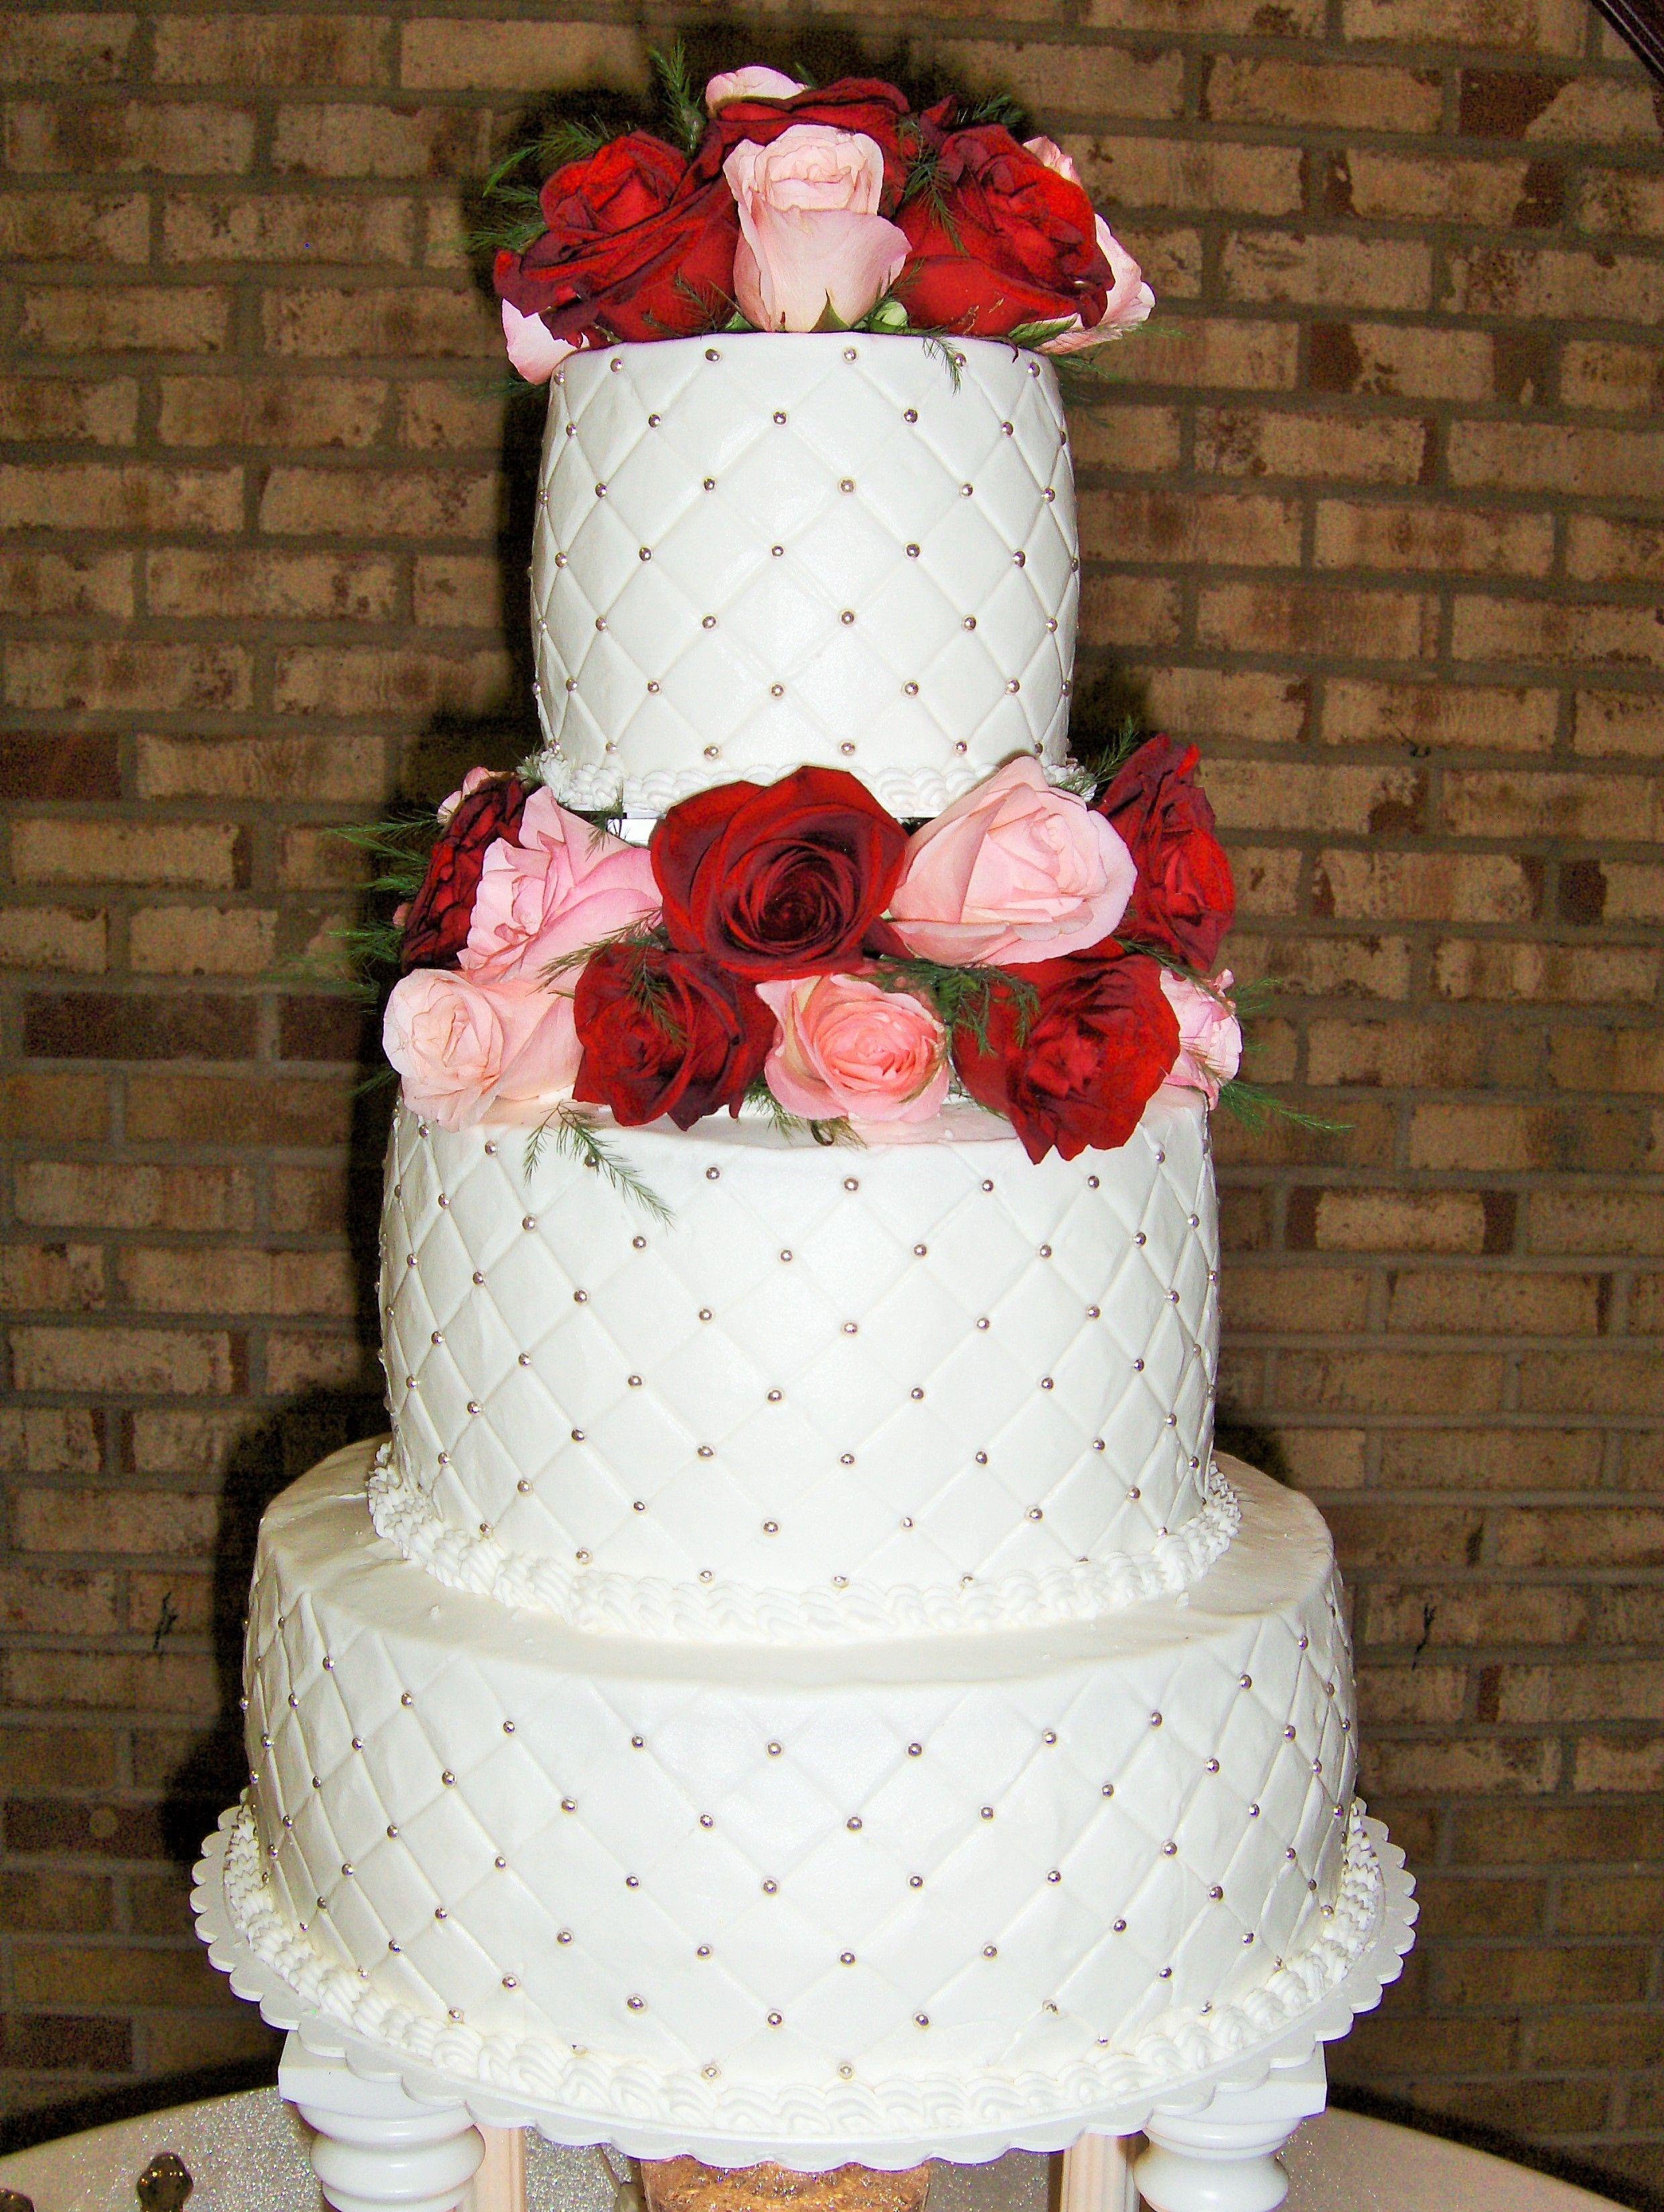 3 Tier Round Wedding Cake With Columns Diamond Pattern Silver